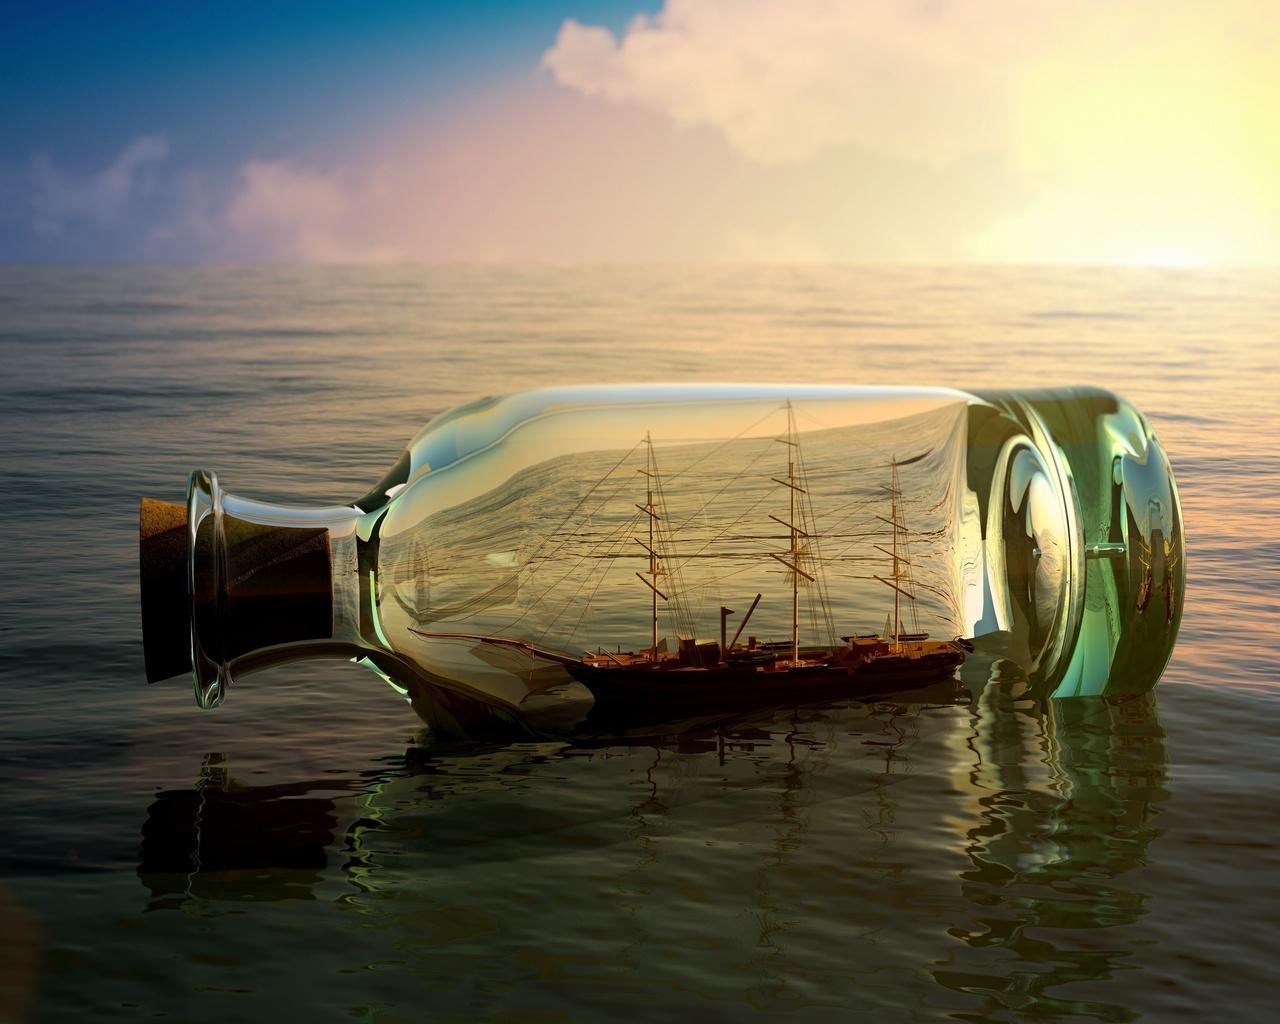 корабль, бутылка, море, небо, солнце, облака